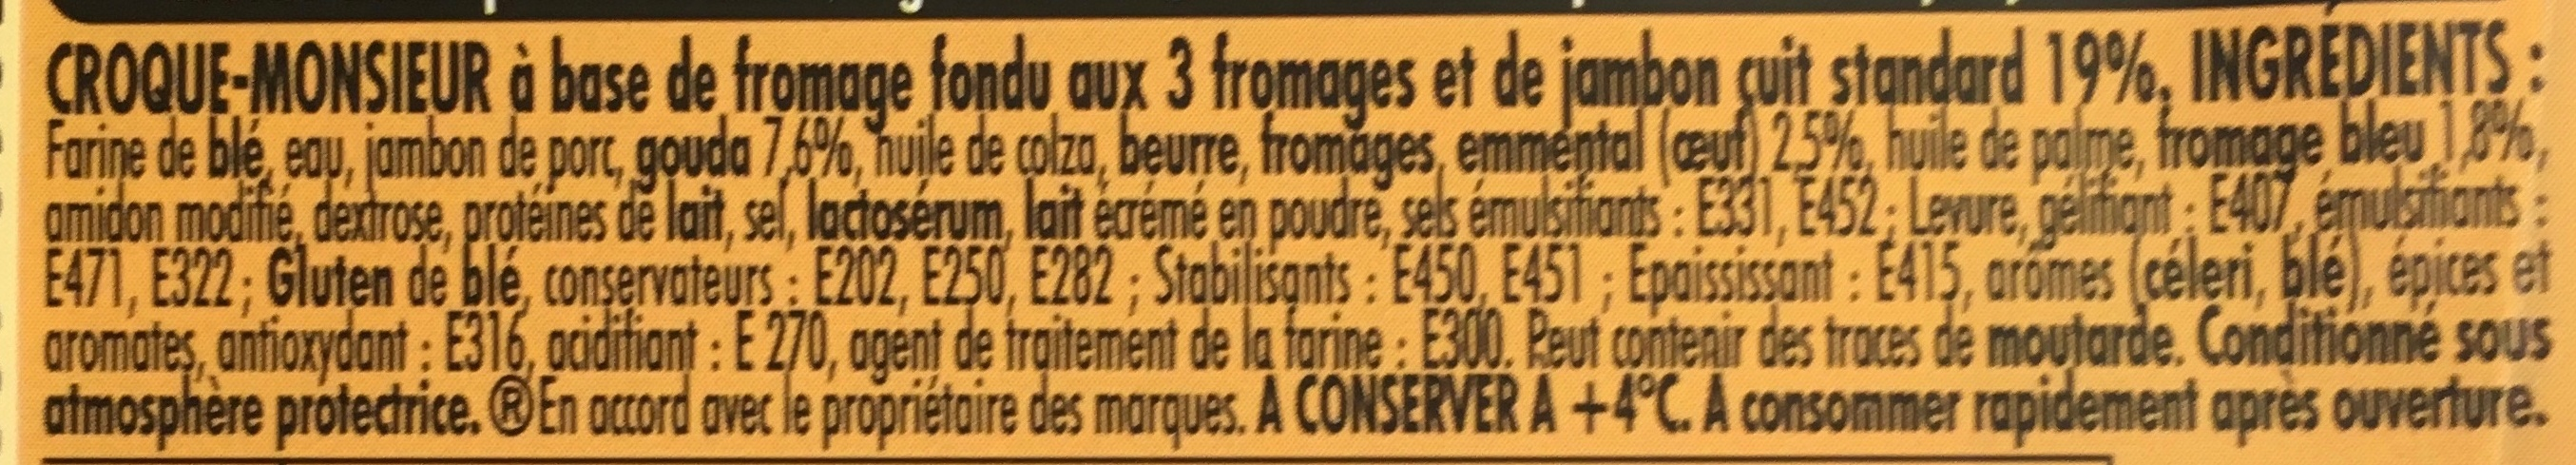 Tendre Croque 3 Fromages - Ingrédients - fr